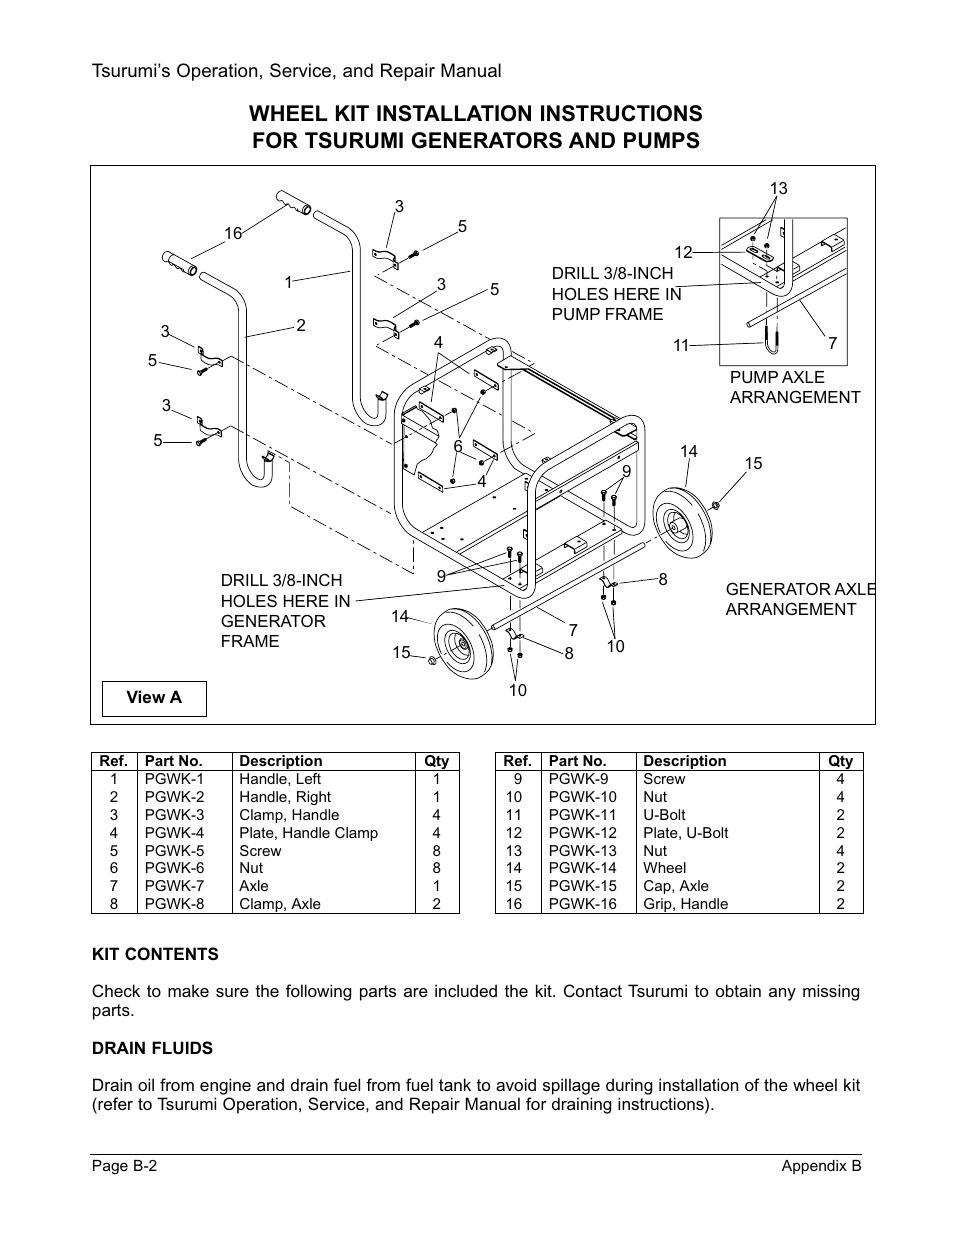 Tsurumi Instruction Manuals Pump Wiring Diagram 1995 Gmc Fuse Box